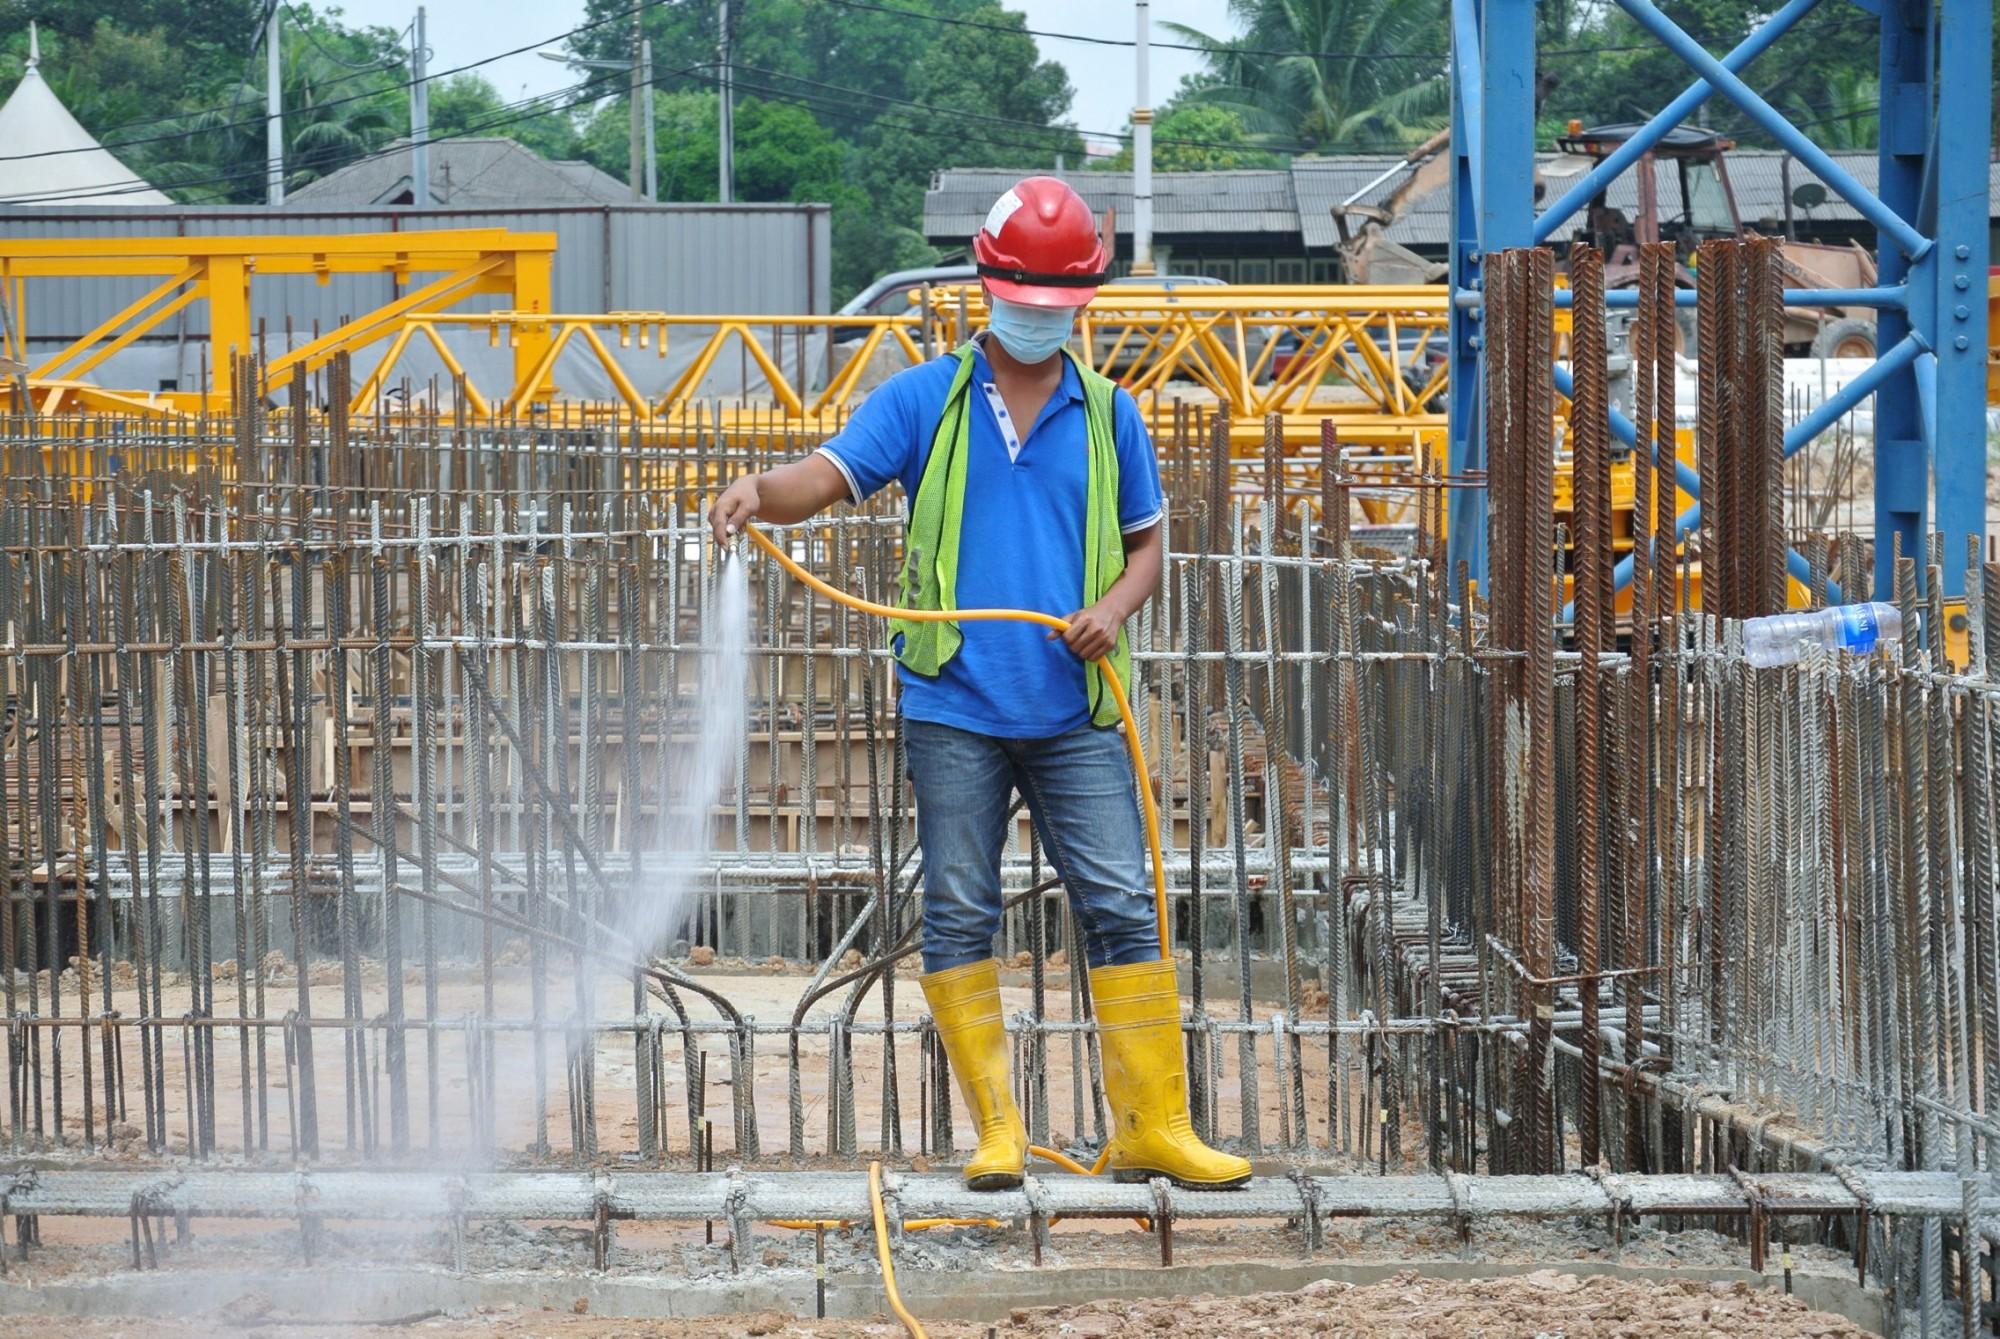 Spraying-the-anti-termite-chemical-treatment-NJ-e1453237971226